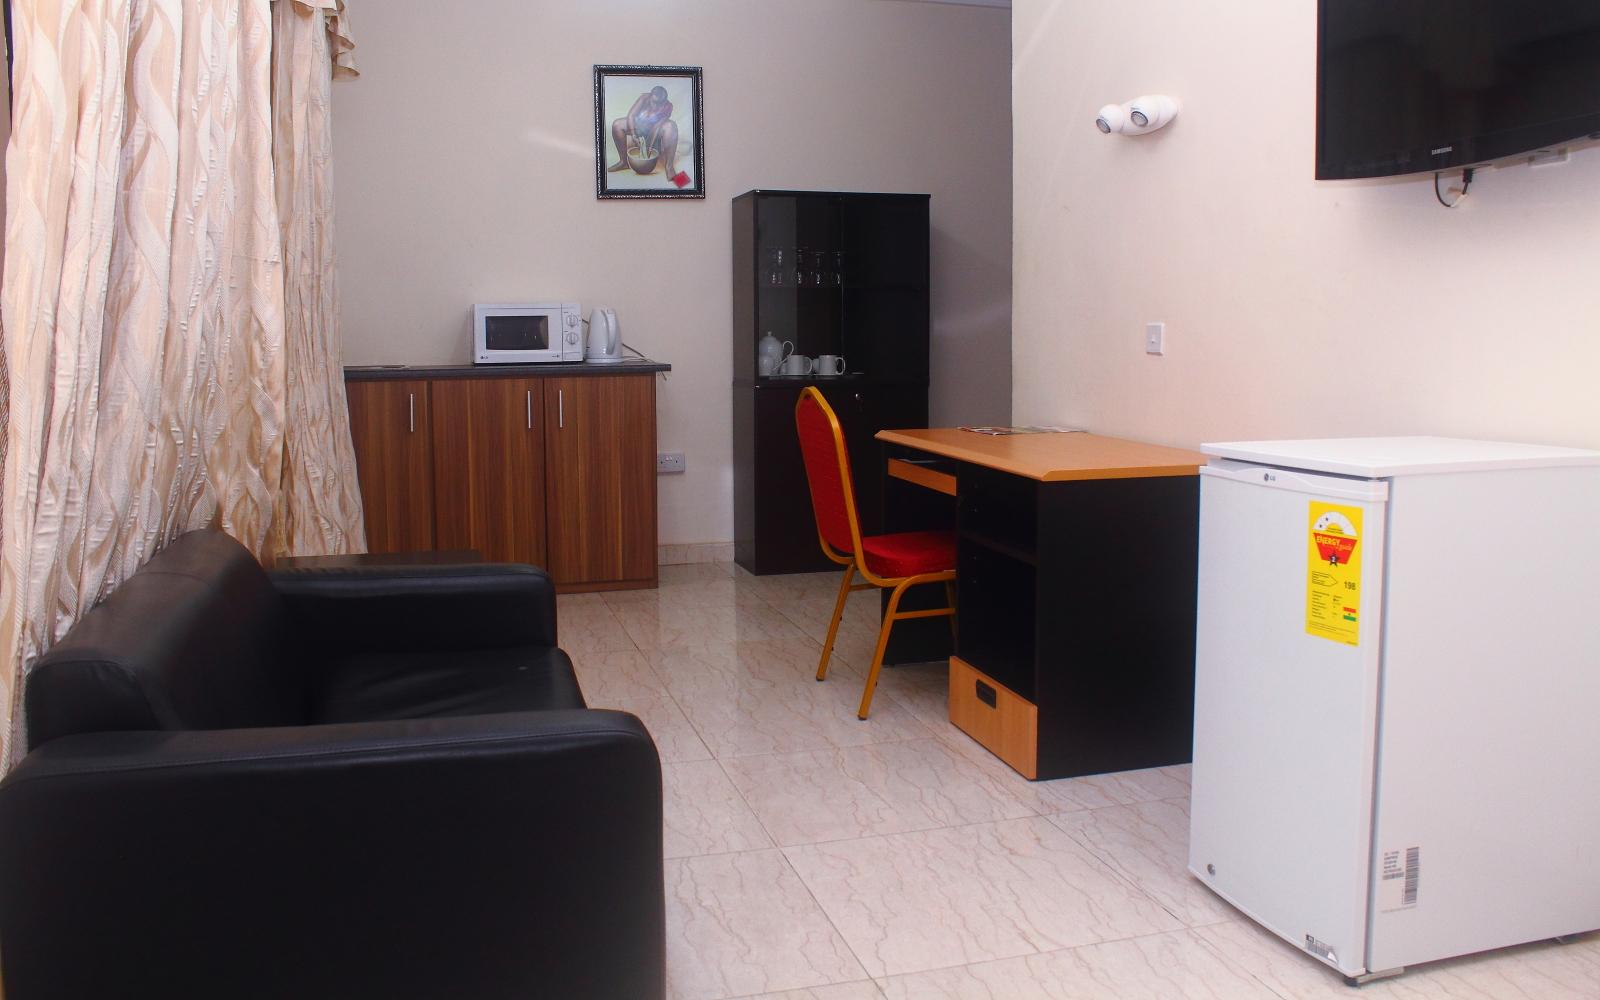 Hotel-stevens-suite